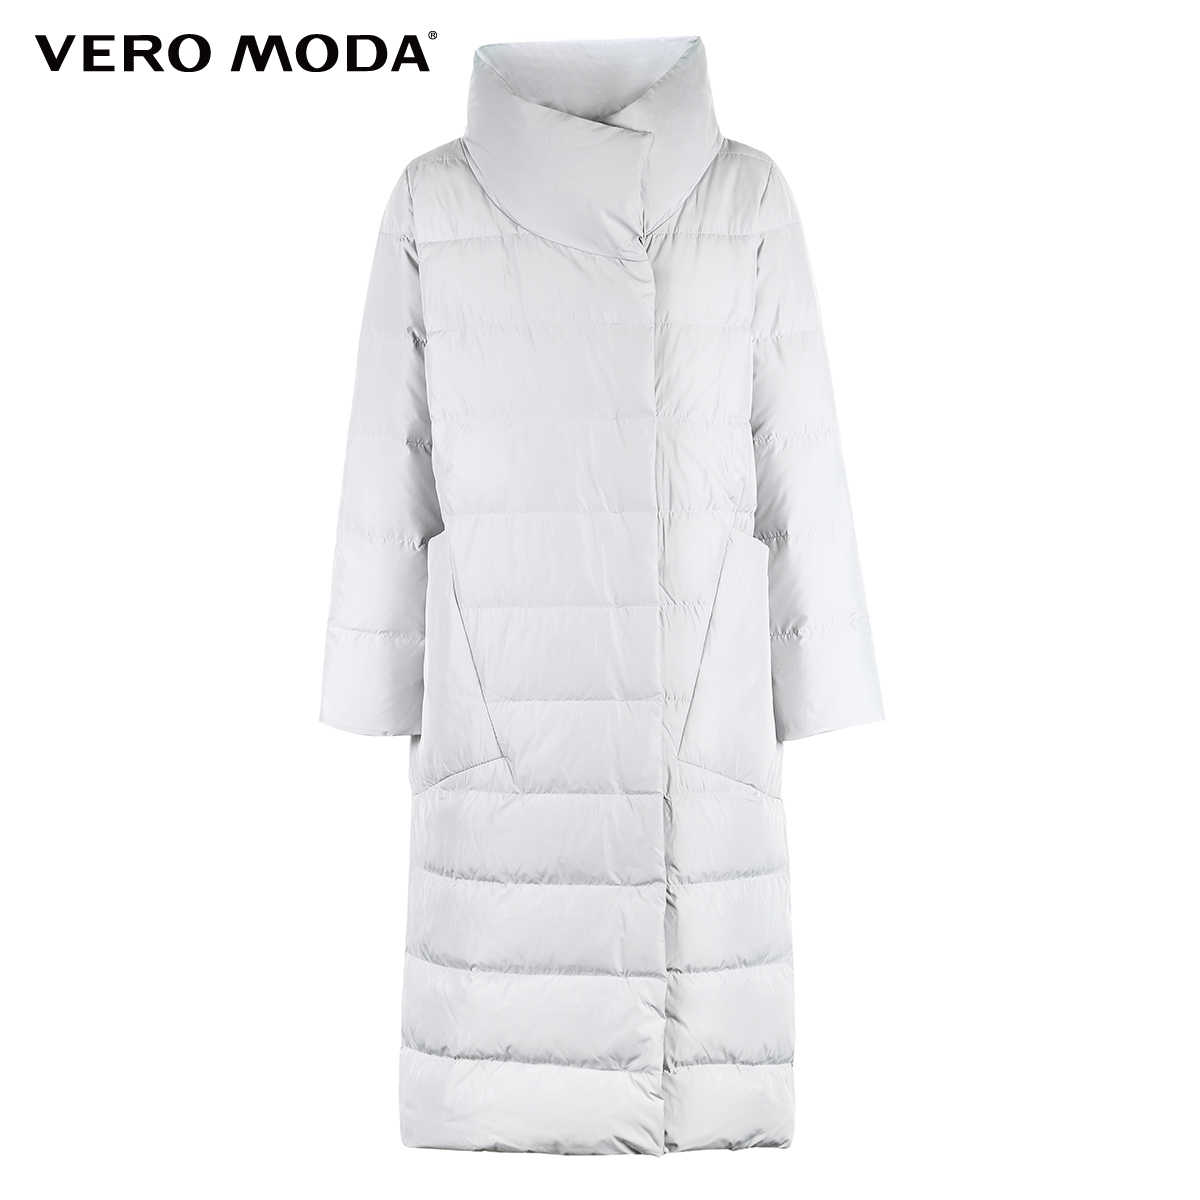 Vero Moda Baru 90% Bebek Putih Sisi Saku Kebesaran Panjang Jaket Wanita   318312511